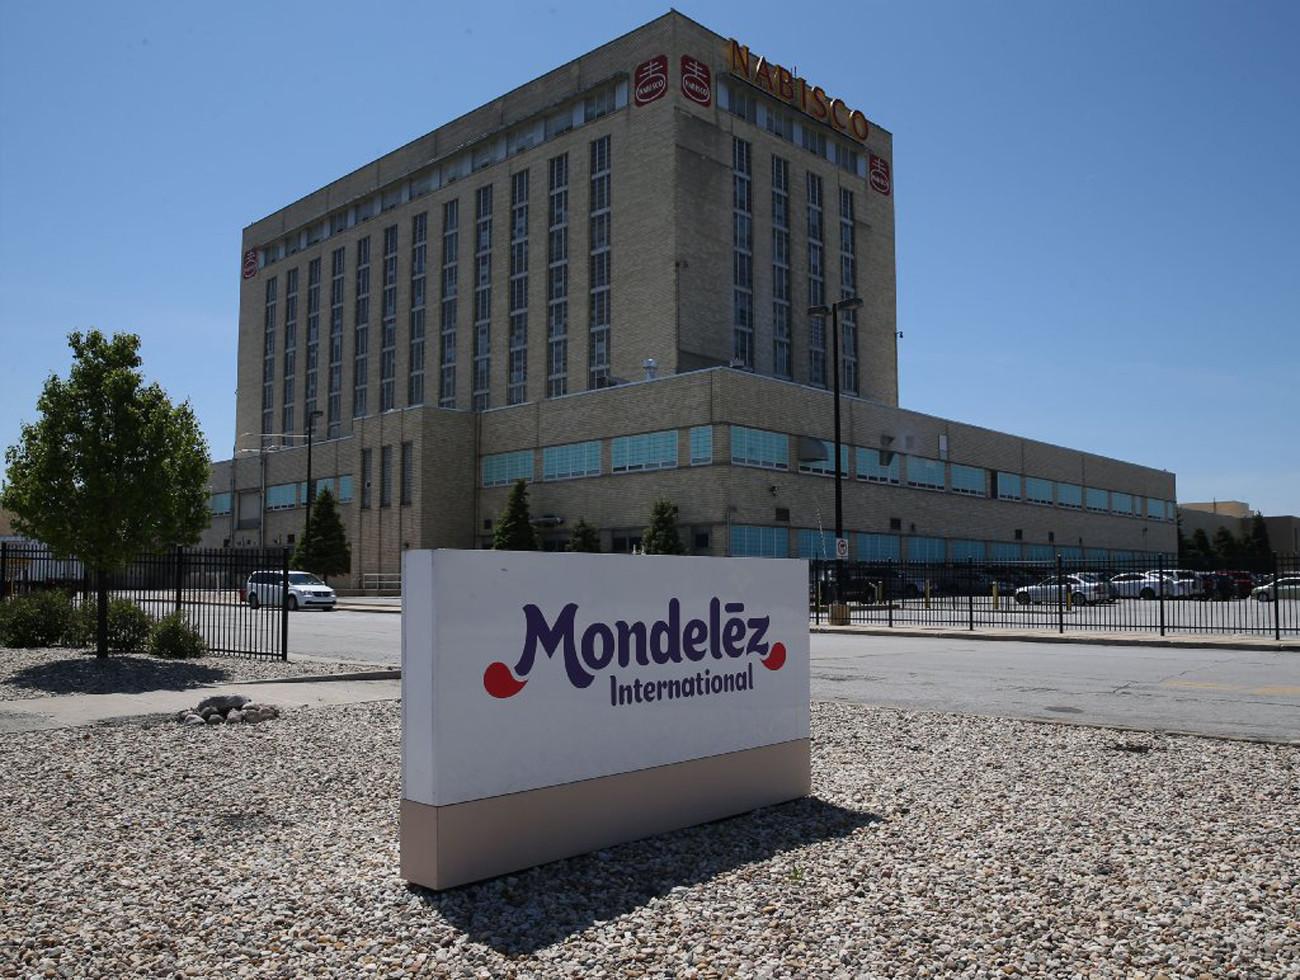 mondelez  job cuts planned at chicago u0026 39 s southwest side